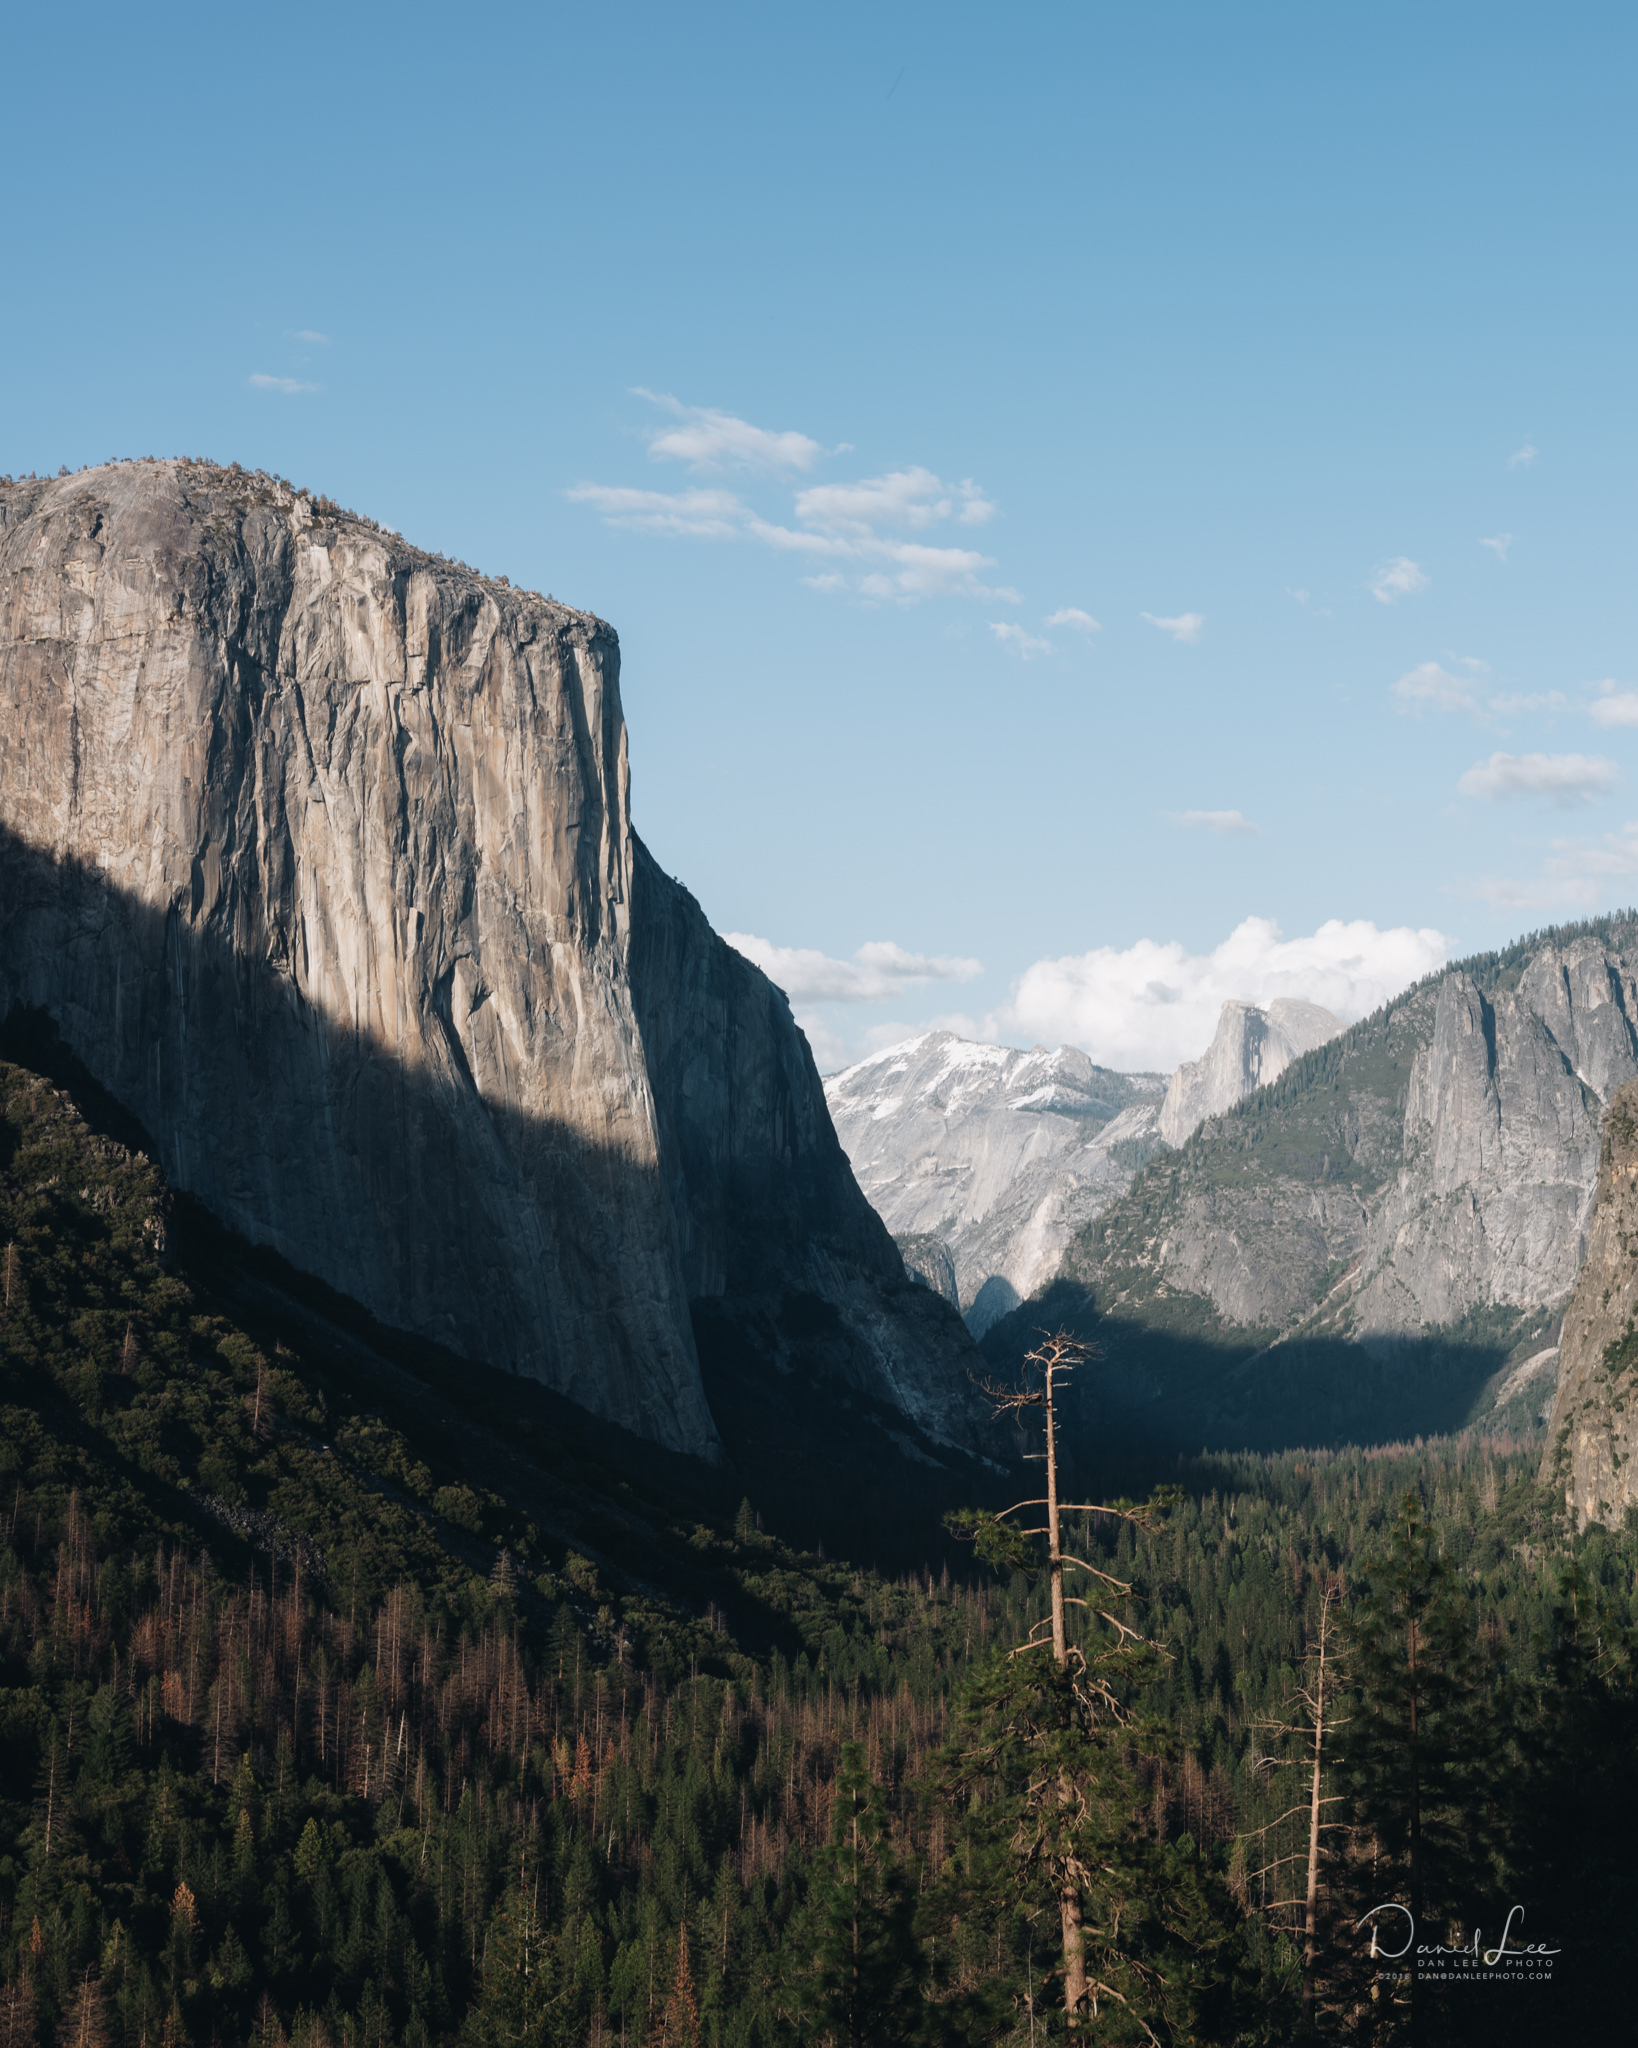 El Capitan in Yosemite National Park. For Pursuits with Enterprise. Photo by Daniel Lee.